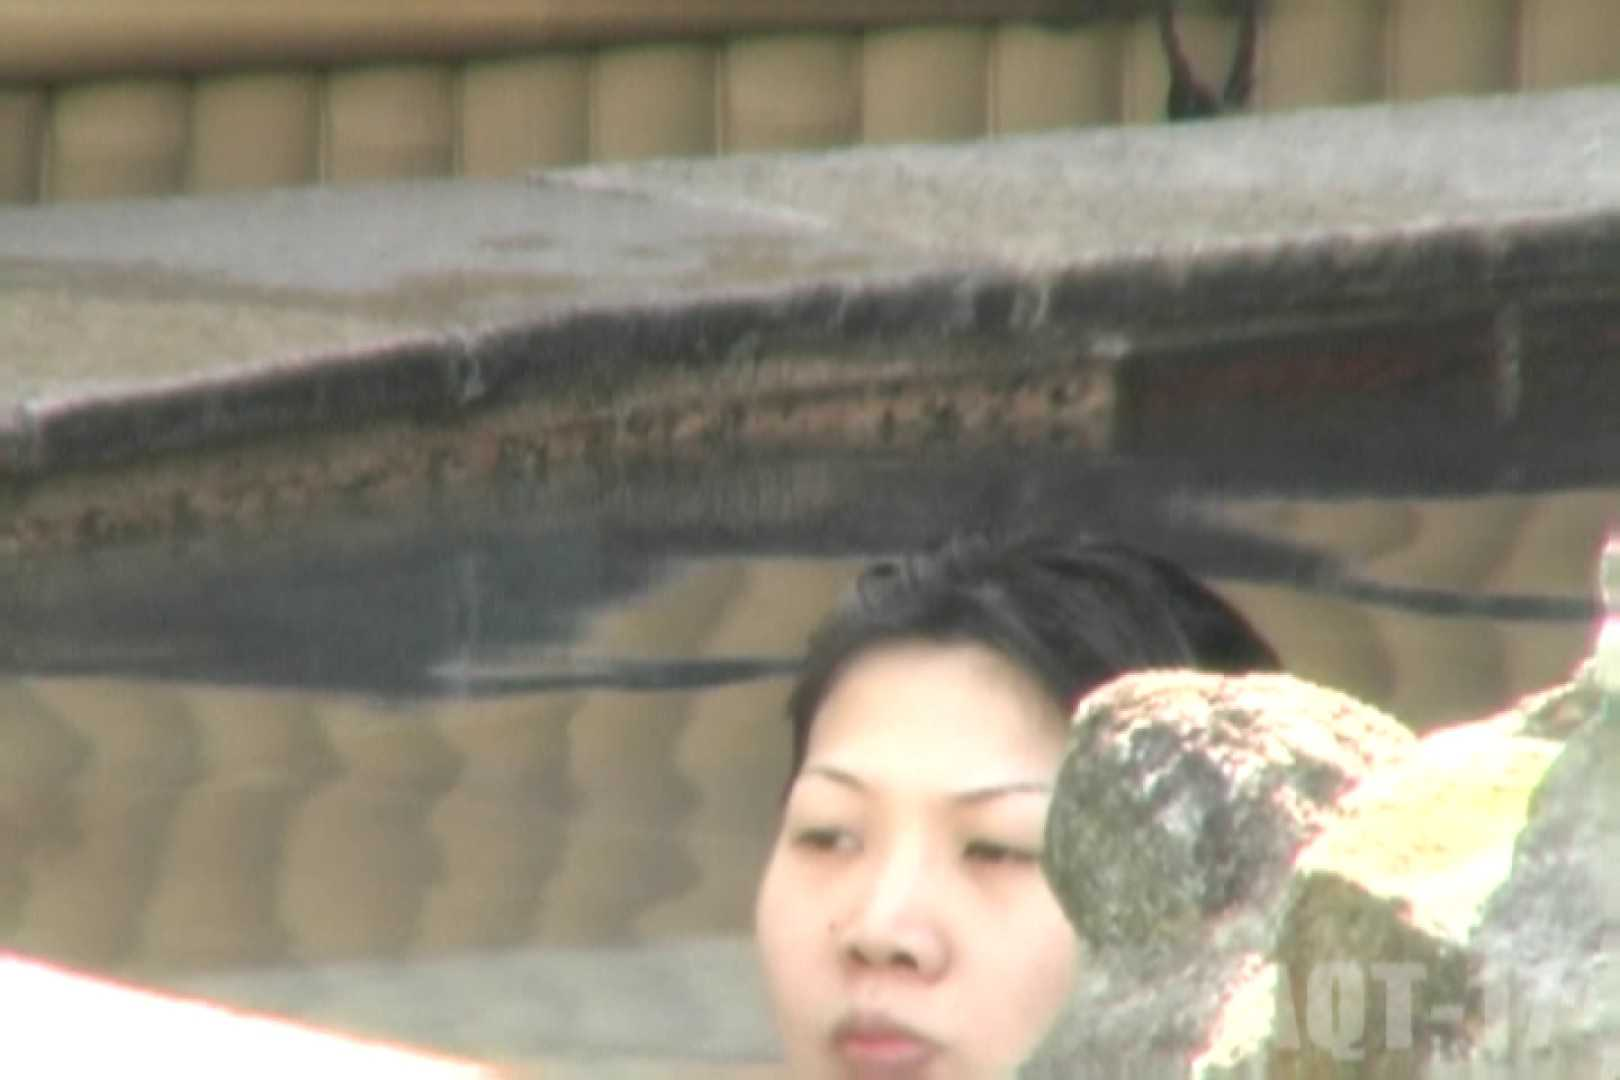 Aquaな露天風呂Vol.850 OLのエロ生活 | 露天風呂  76連発 25